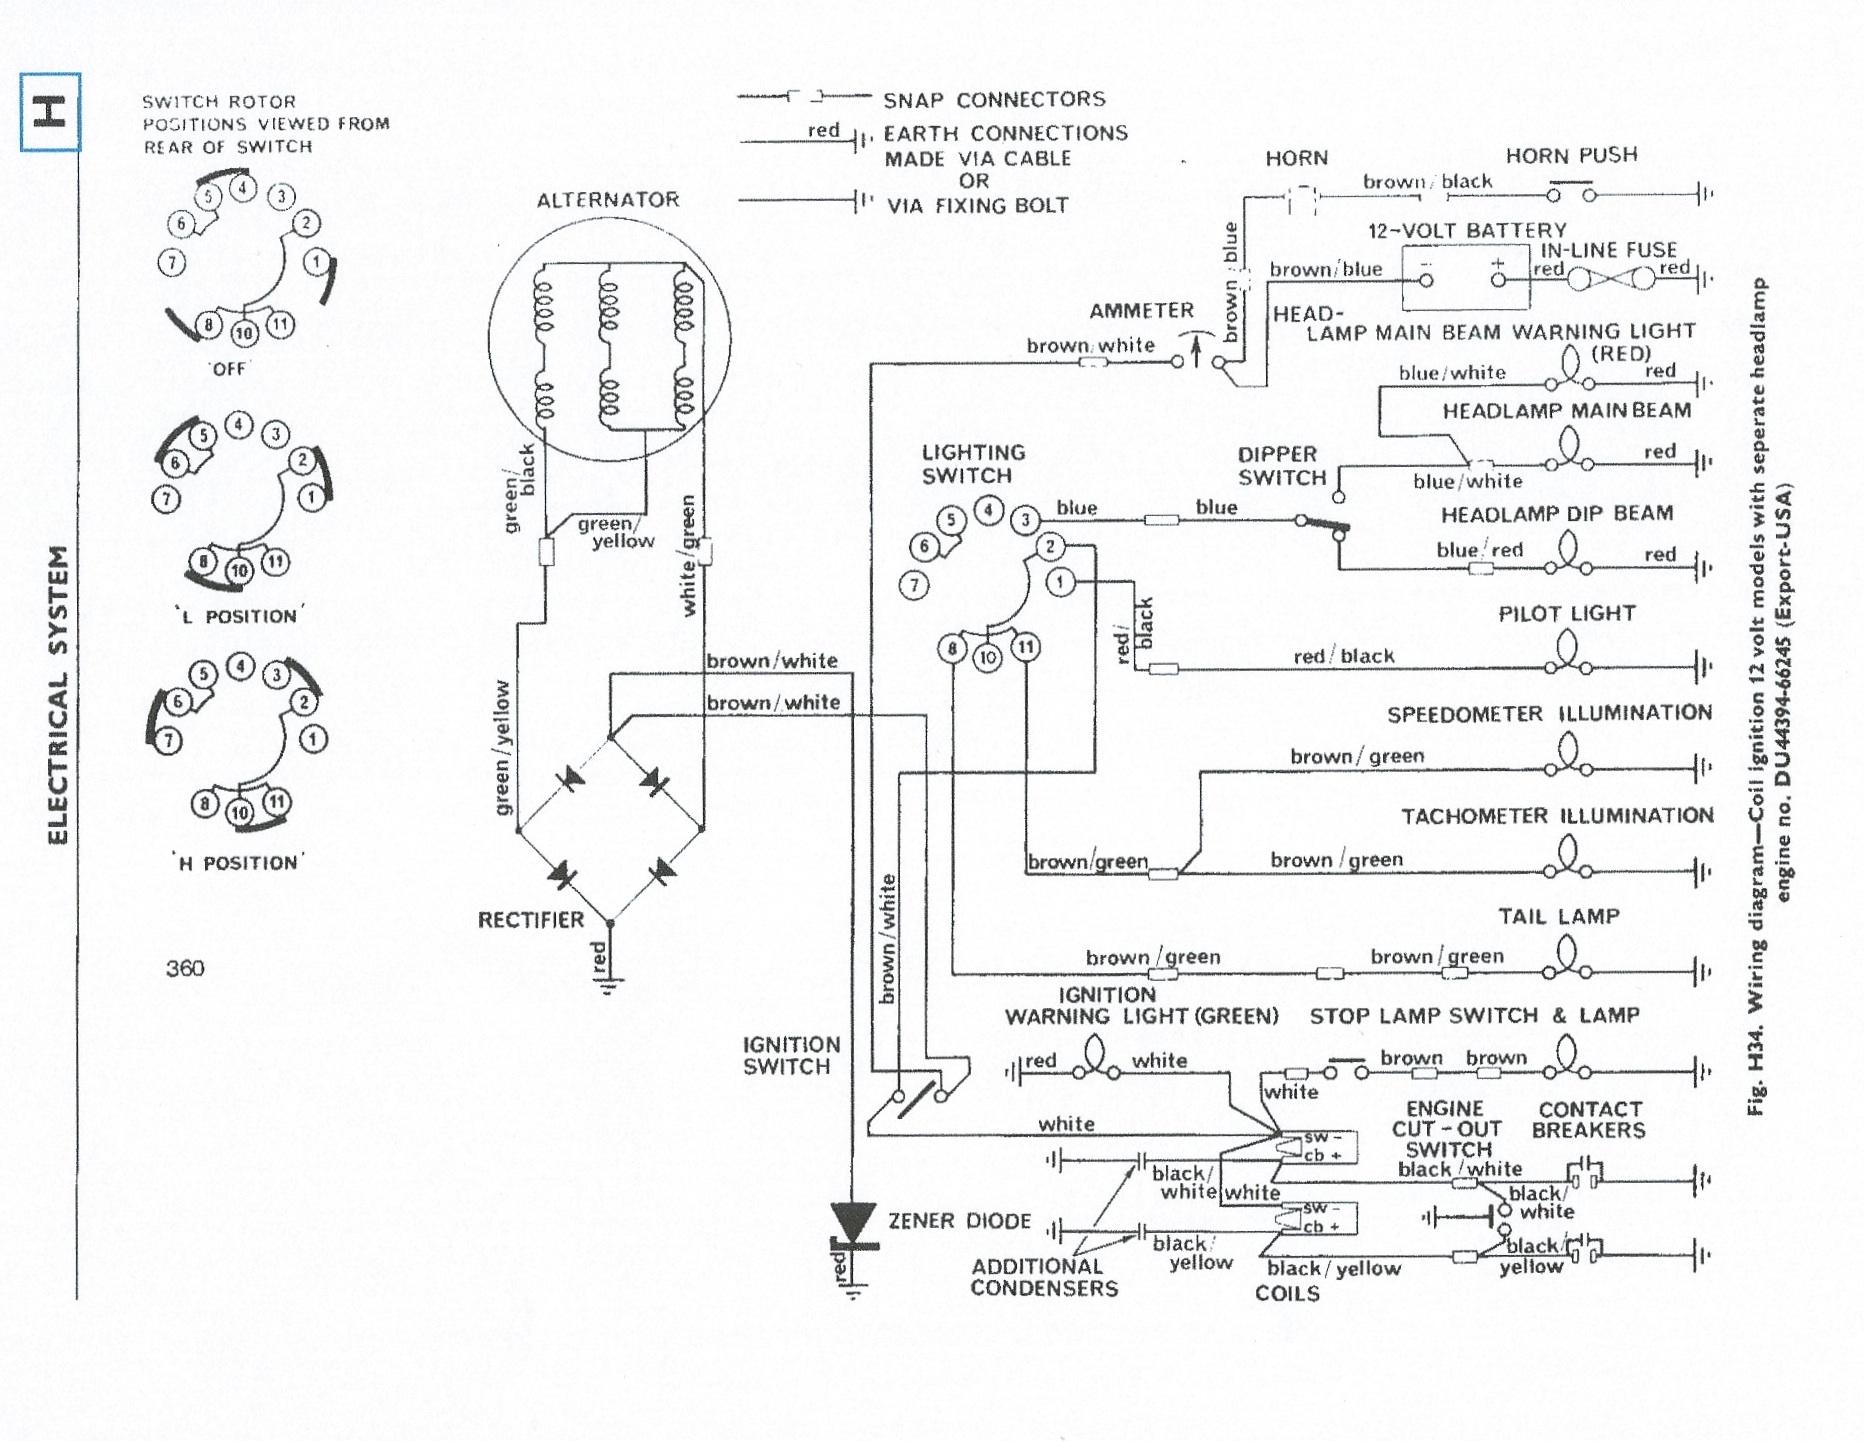 Attractive 1976 Tr6 Wiring Diagram Collection - Wiring Diagram Ideas ...